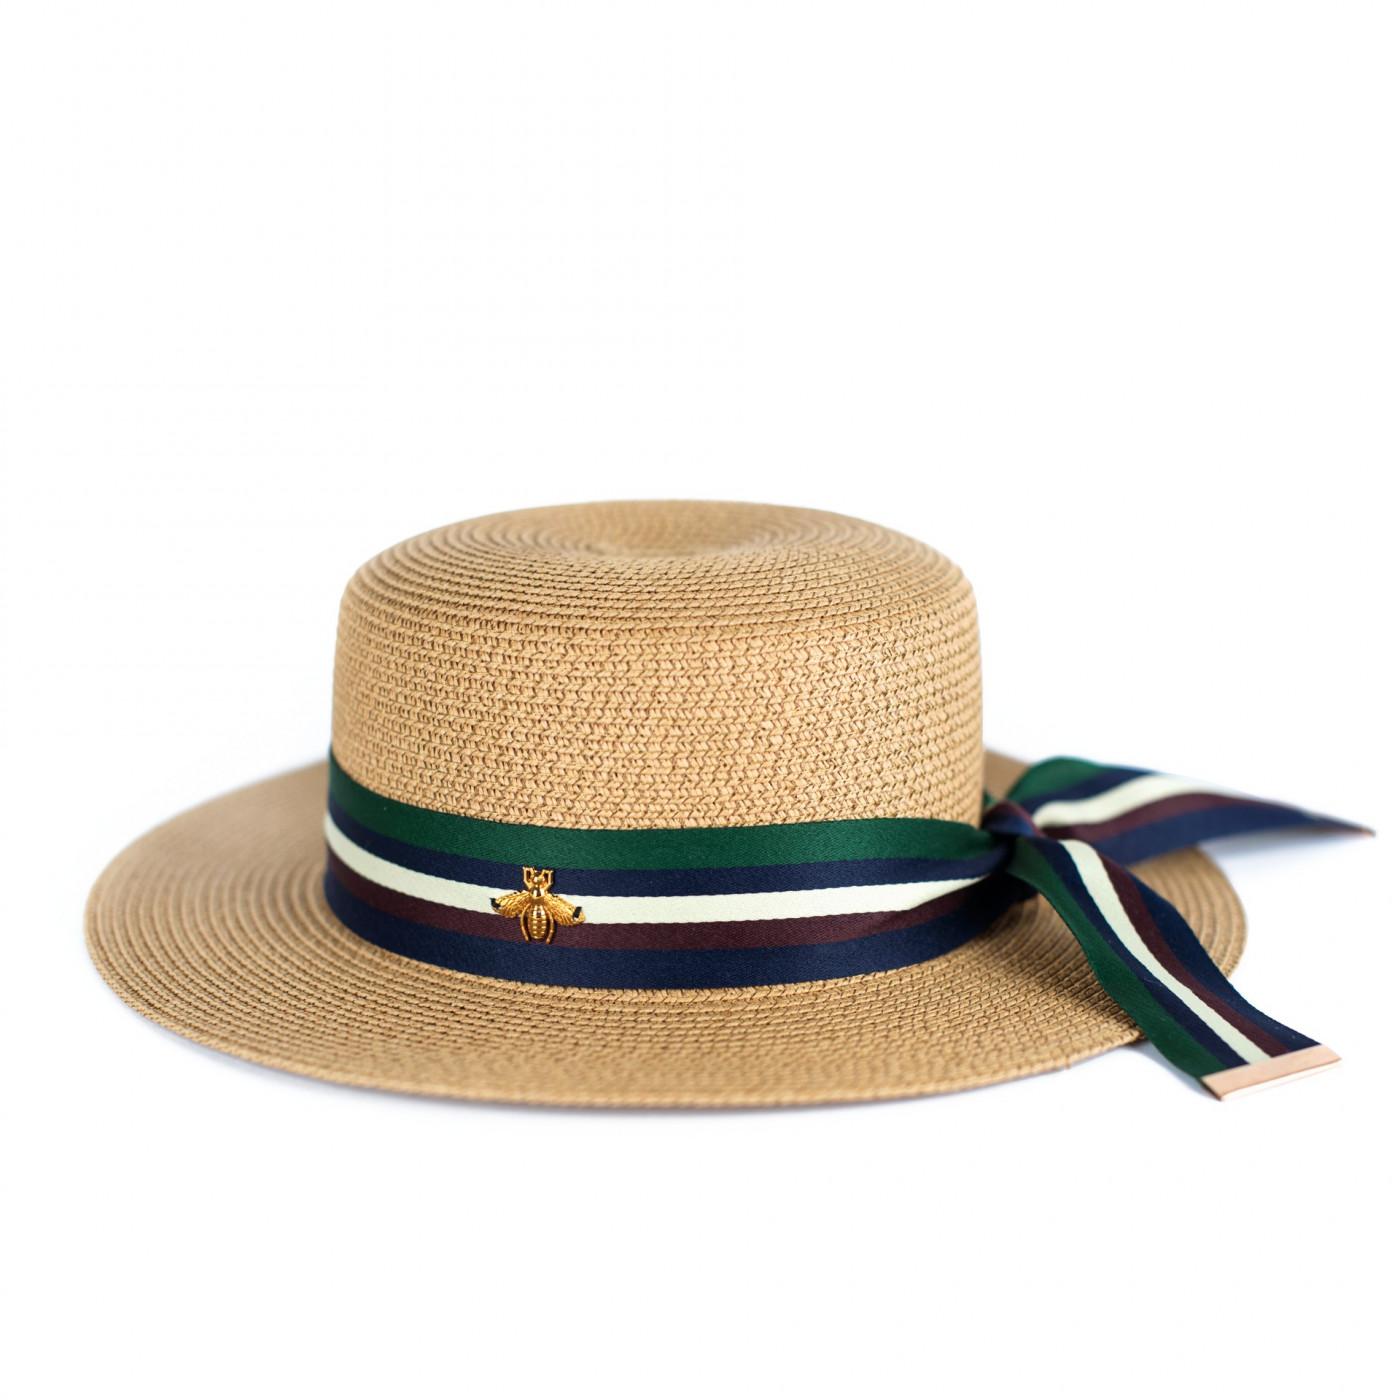 Art Of Polo Woman's Hat cz20184-1 Dark